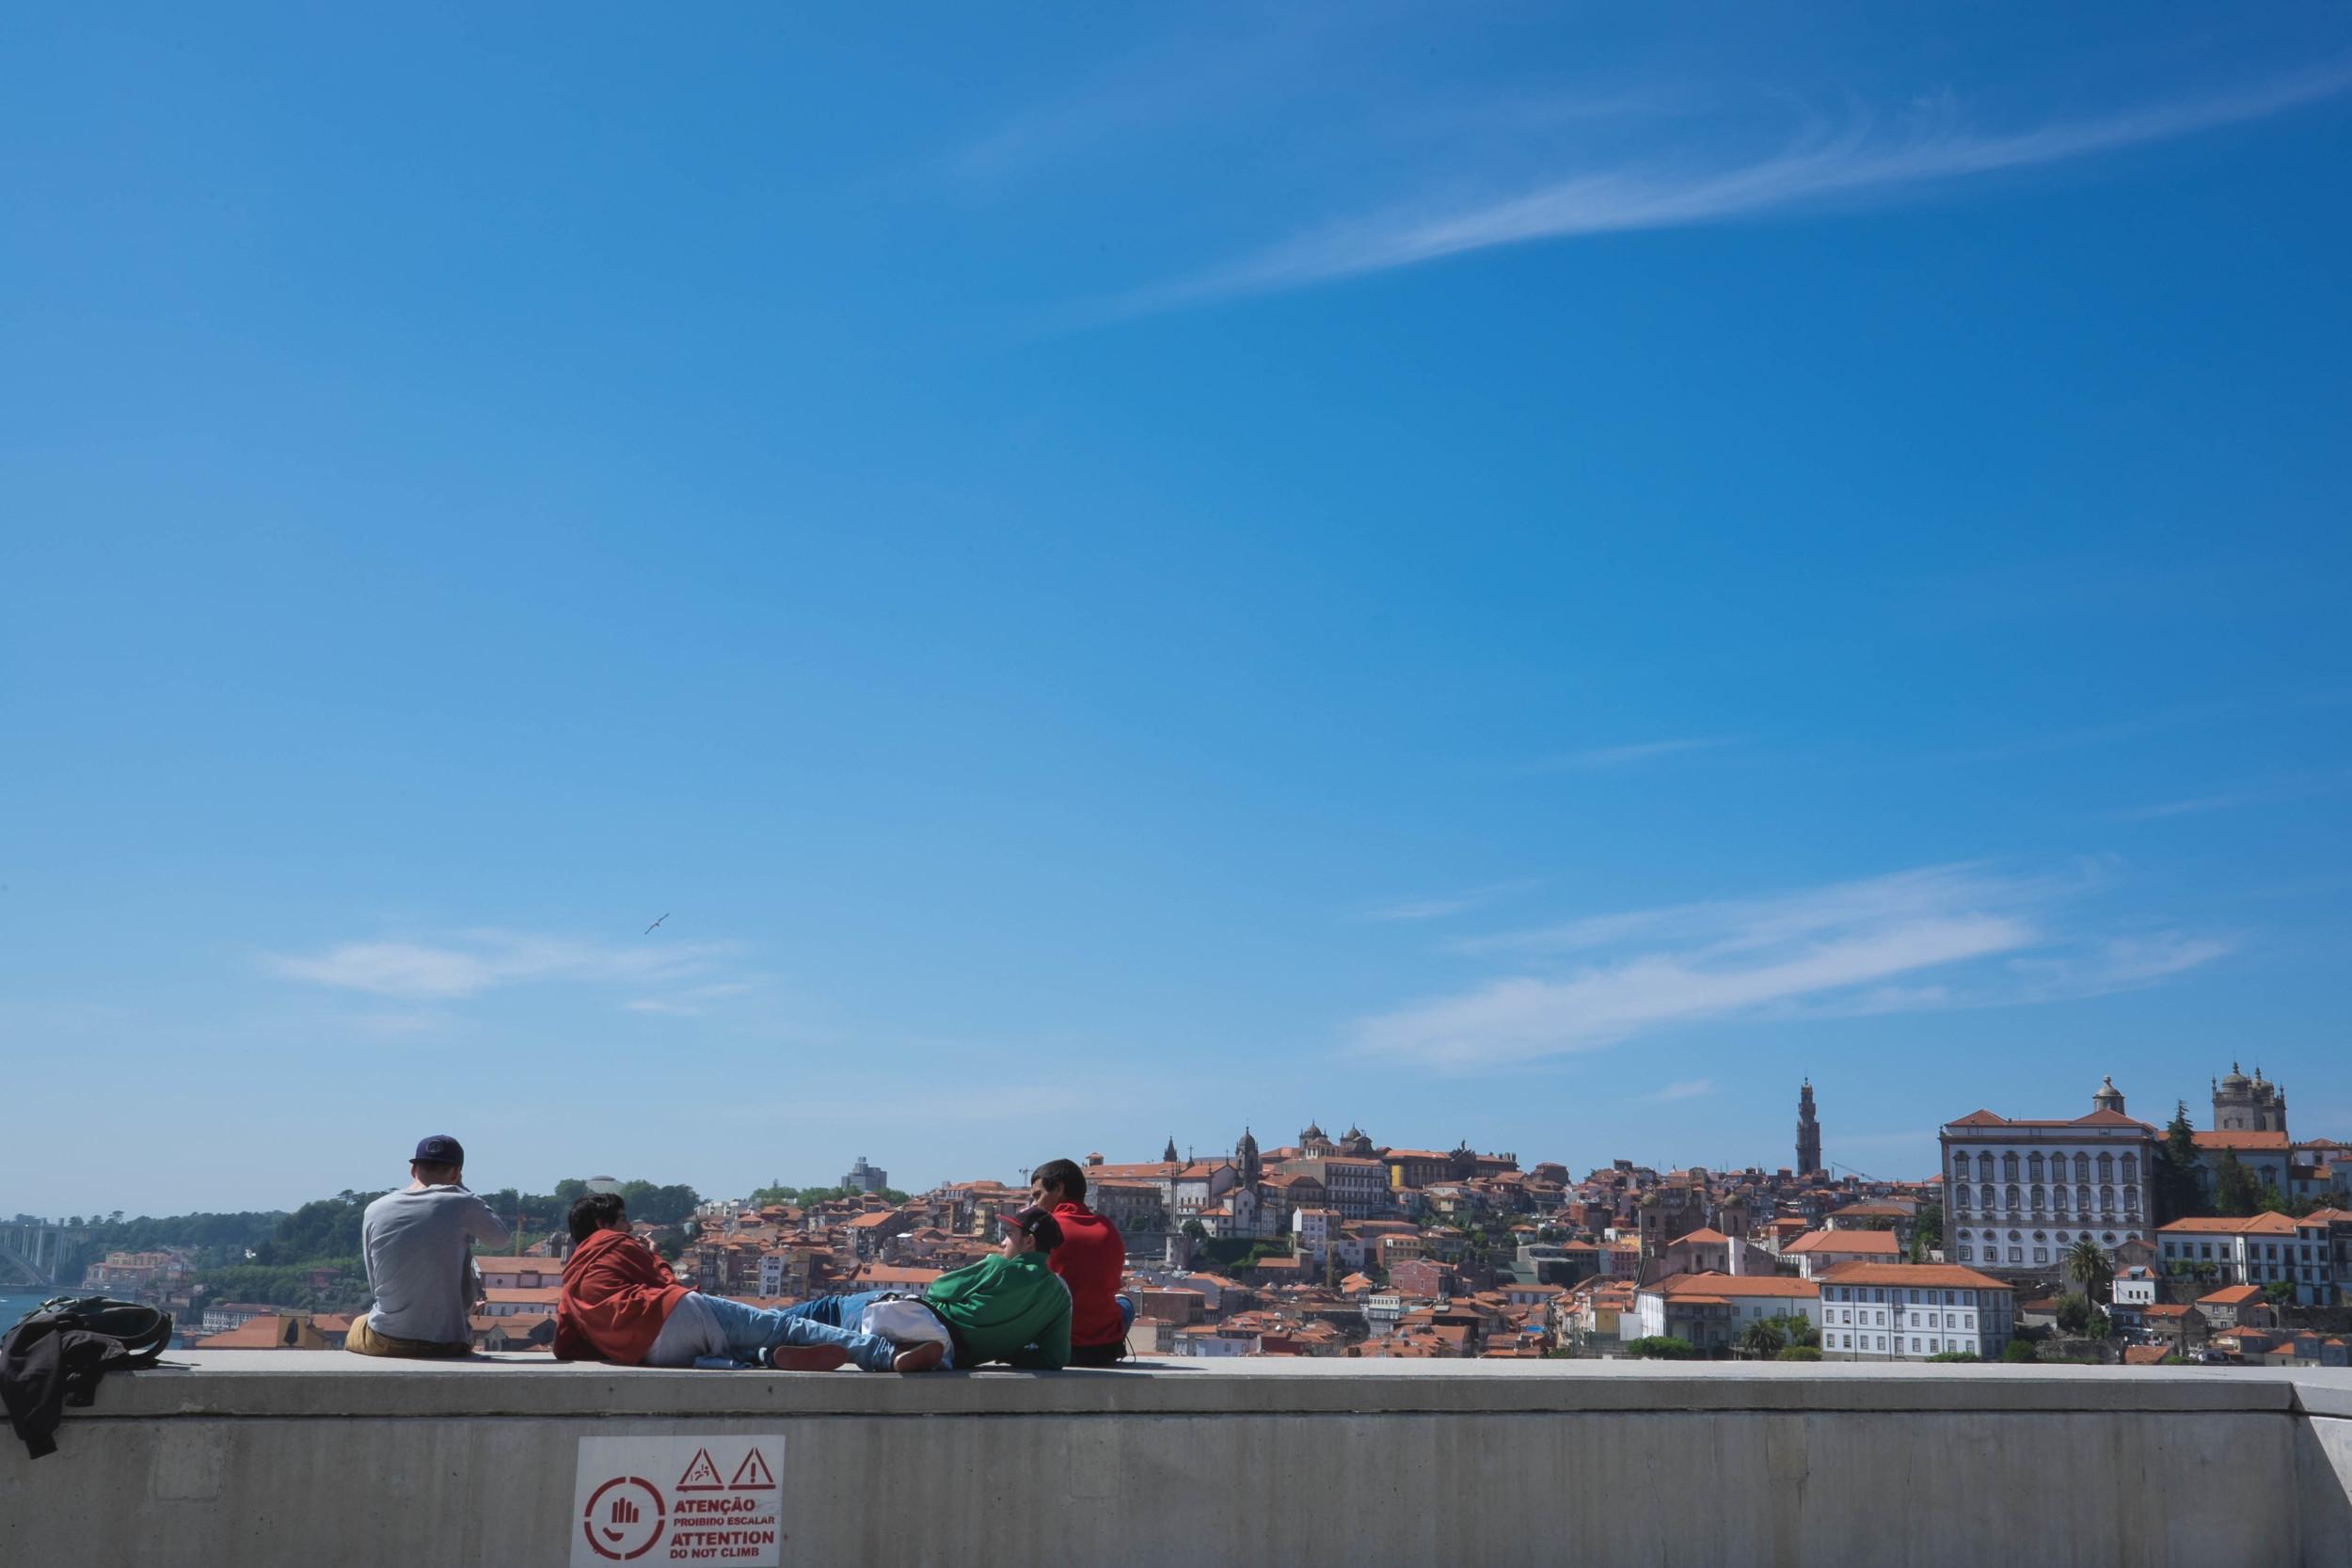 Kristen_Humbert_Philadelpia_Photographer_Travel_Editorial_Portugal-4096.jpg